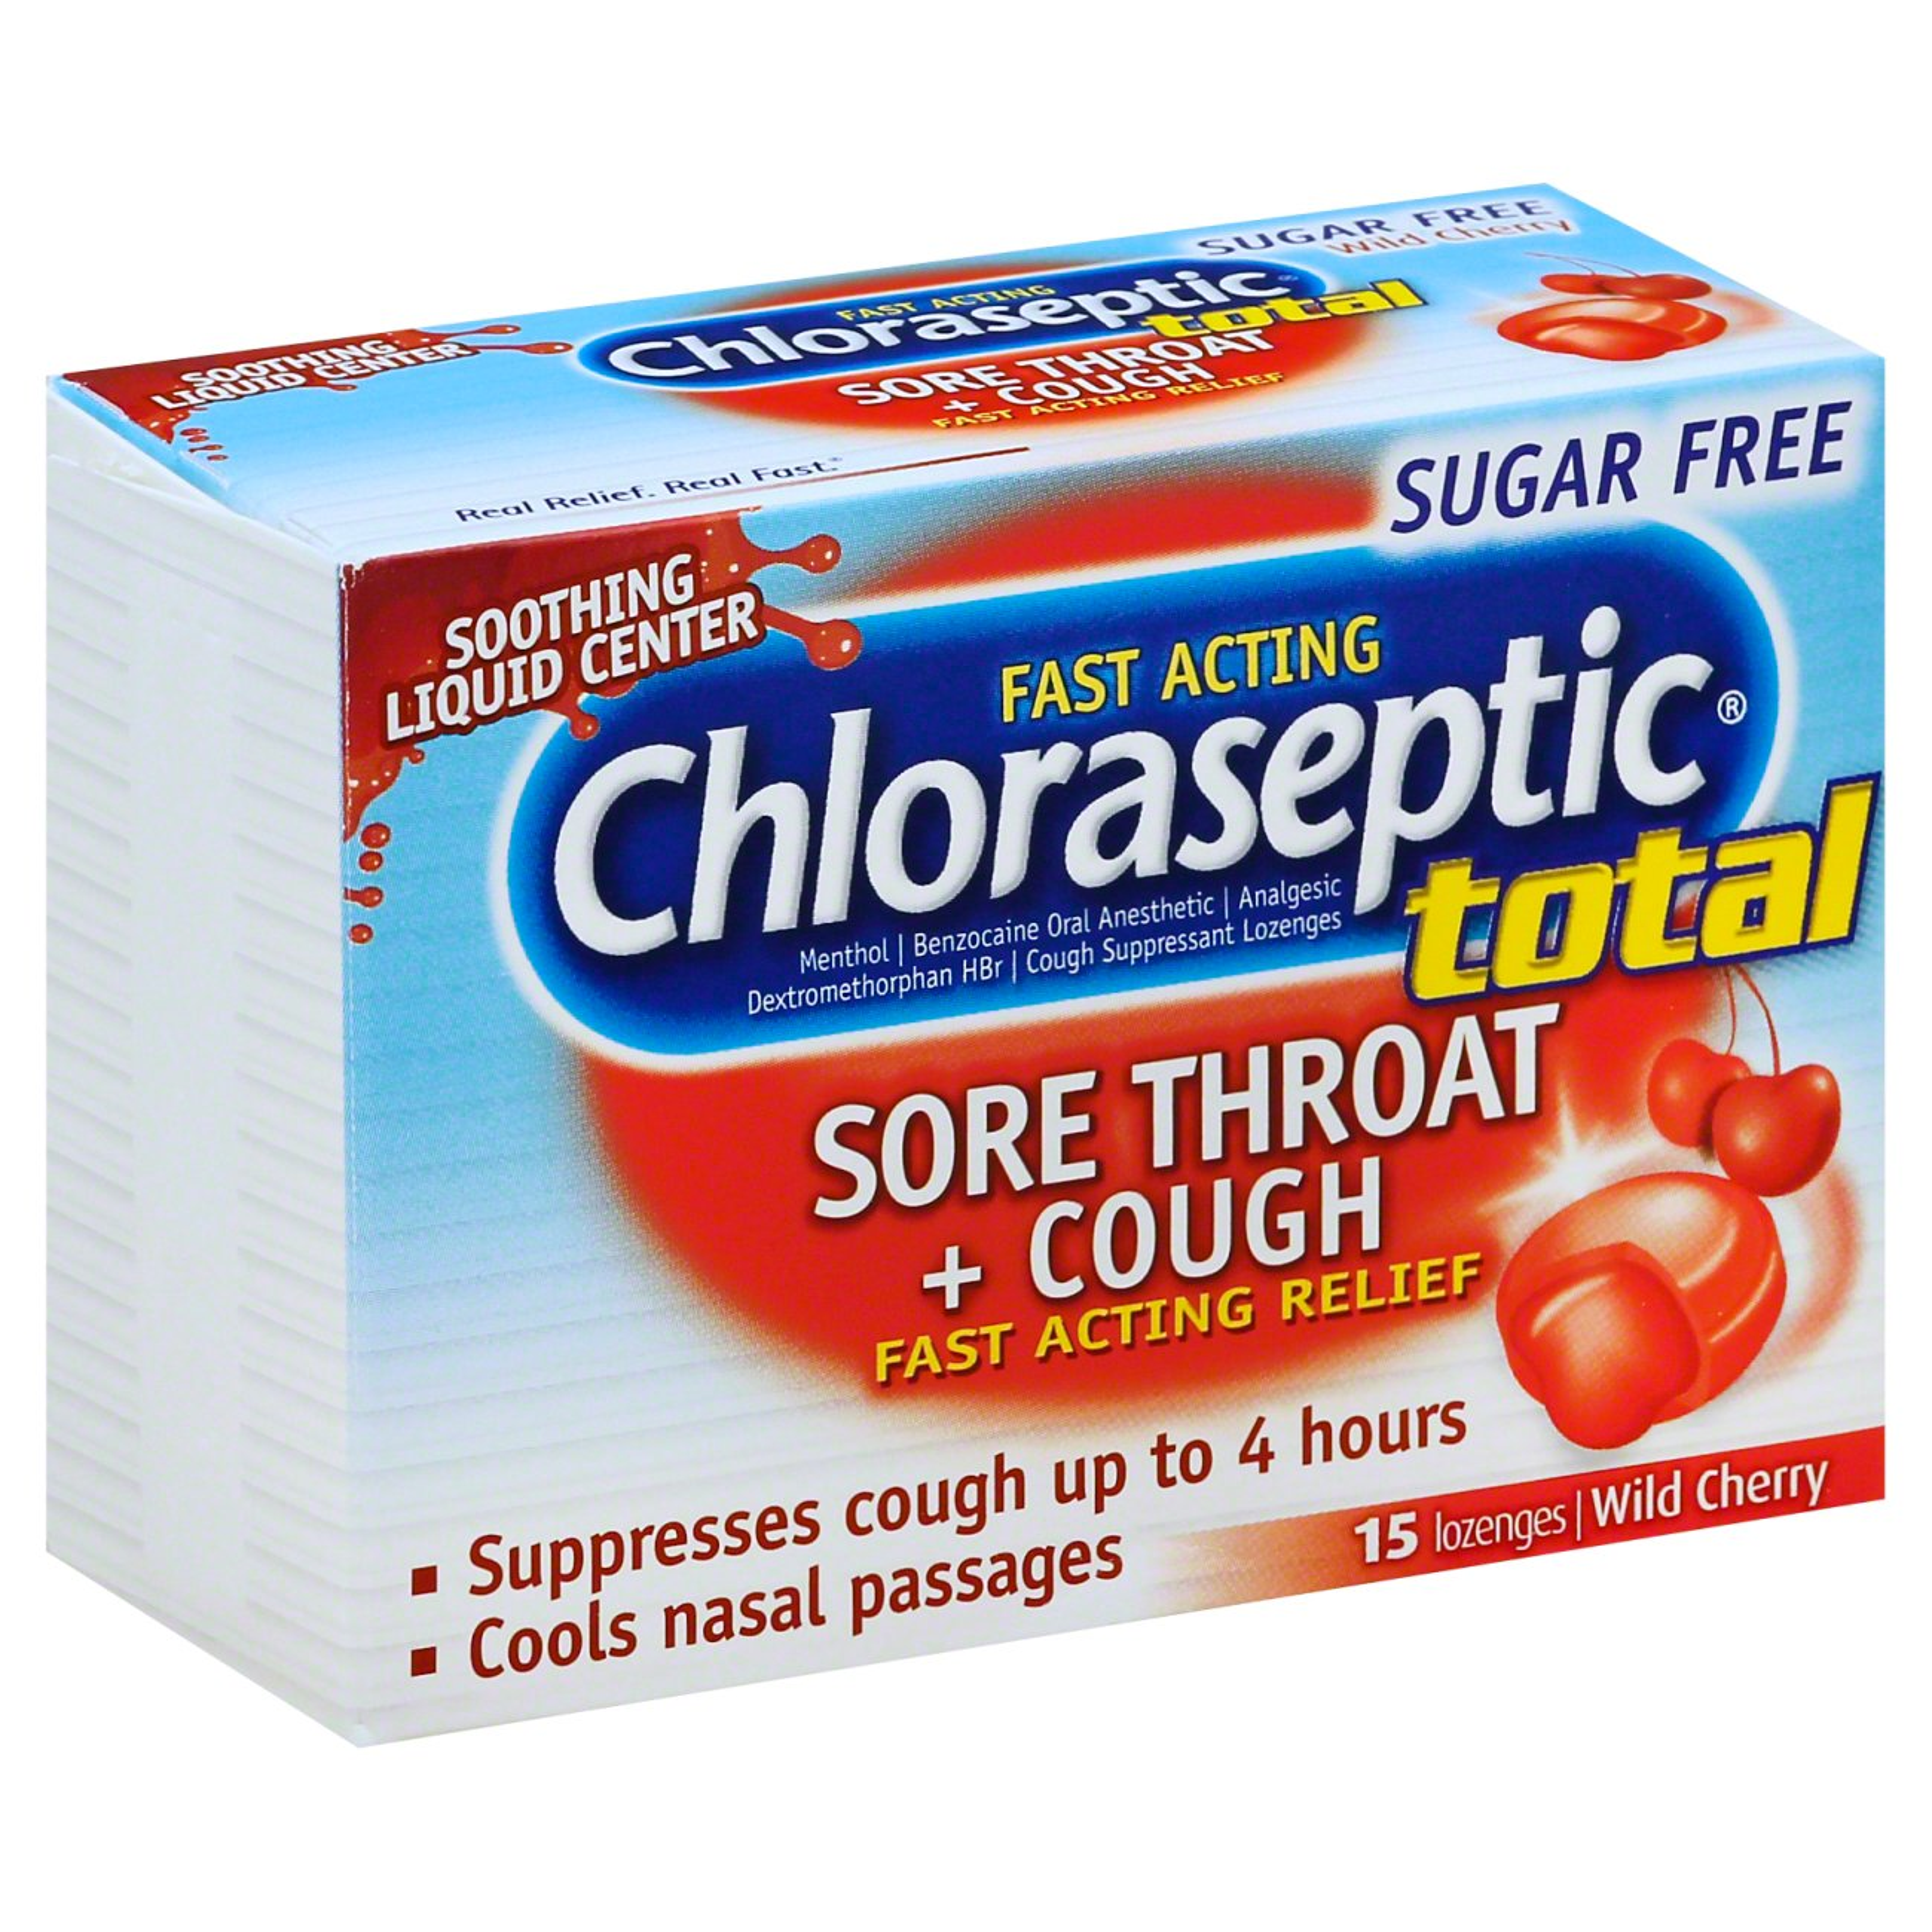 Chloraseptic Sugar Free Total Sore Throat + Cough Lozenges ‑ Shop Cough,  Cold & Flu at H‑E‑B